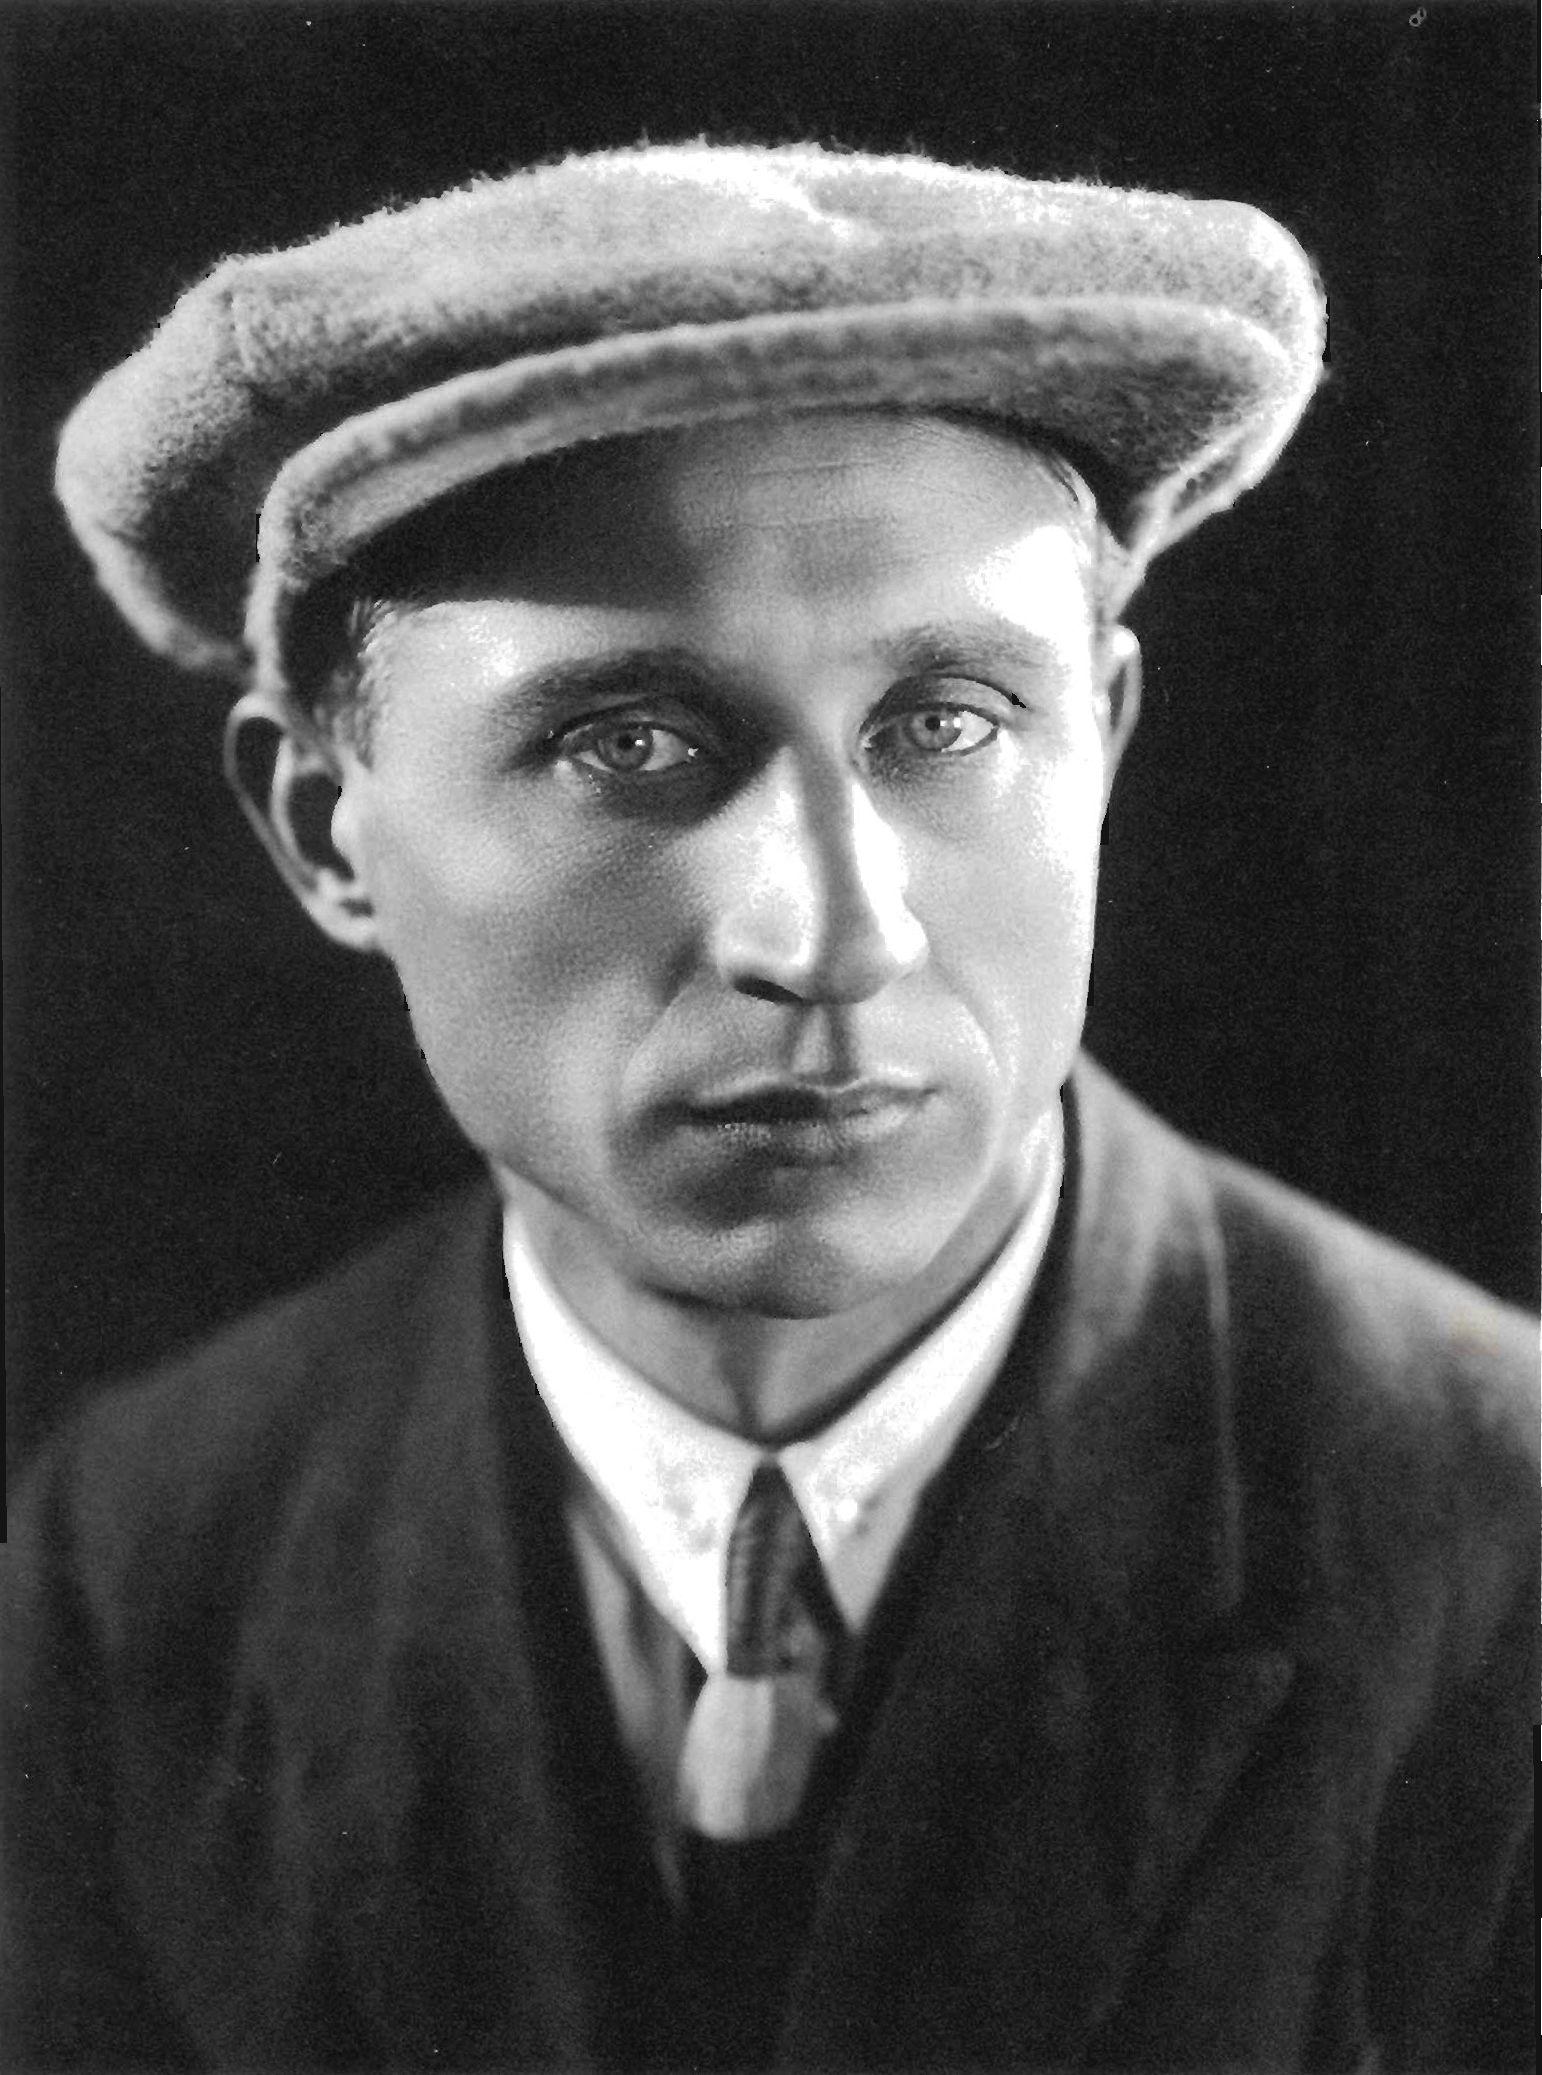 Эдуард Тиссэ, оператор, снявший все фильмы Сергея Эйзенштейна